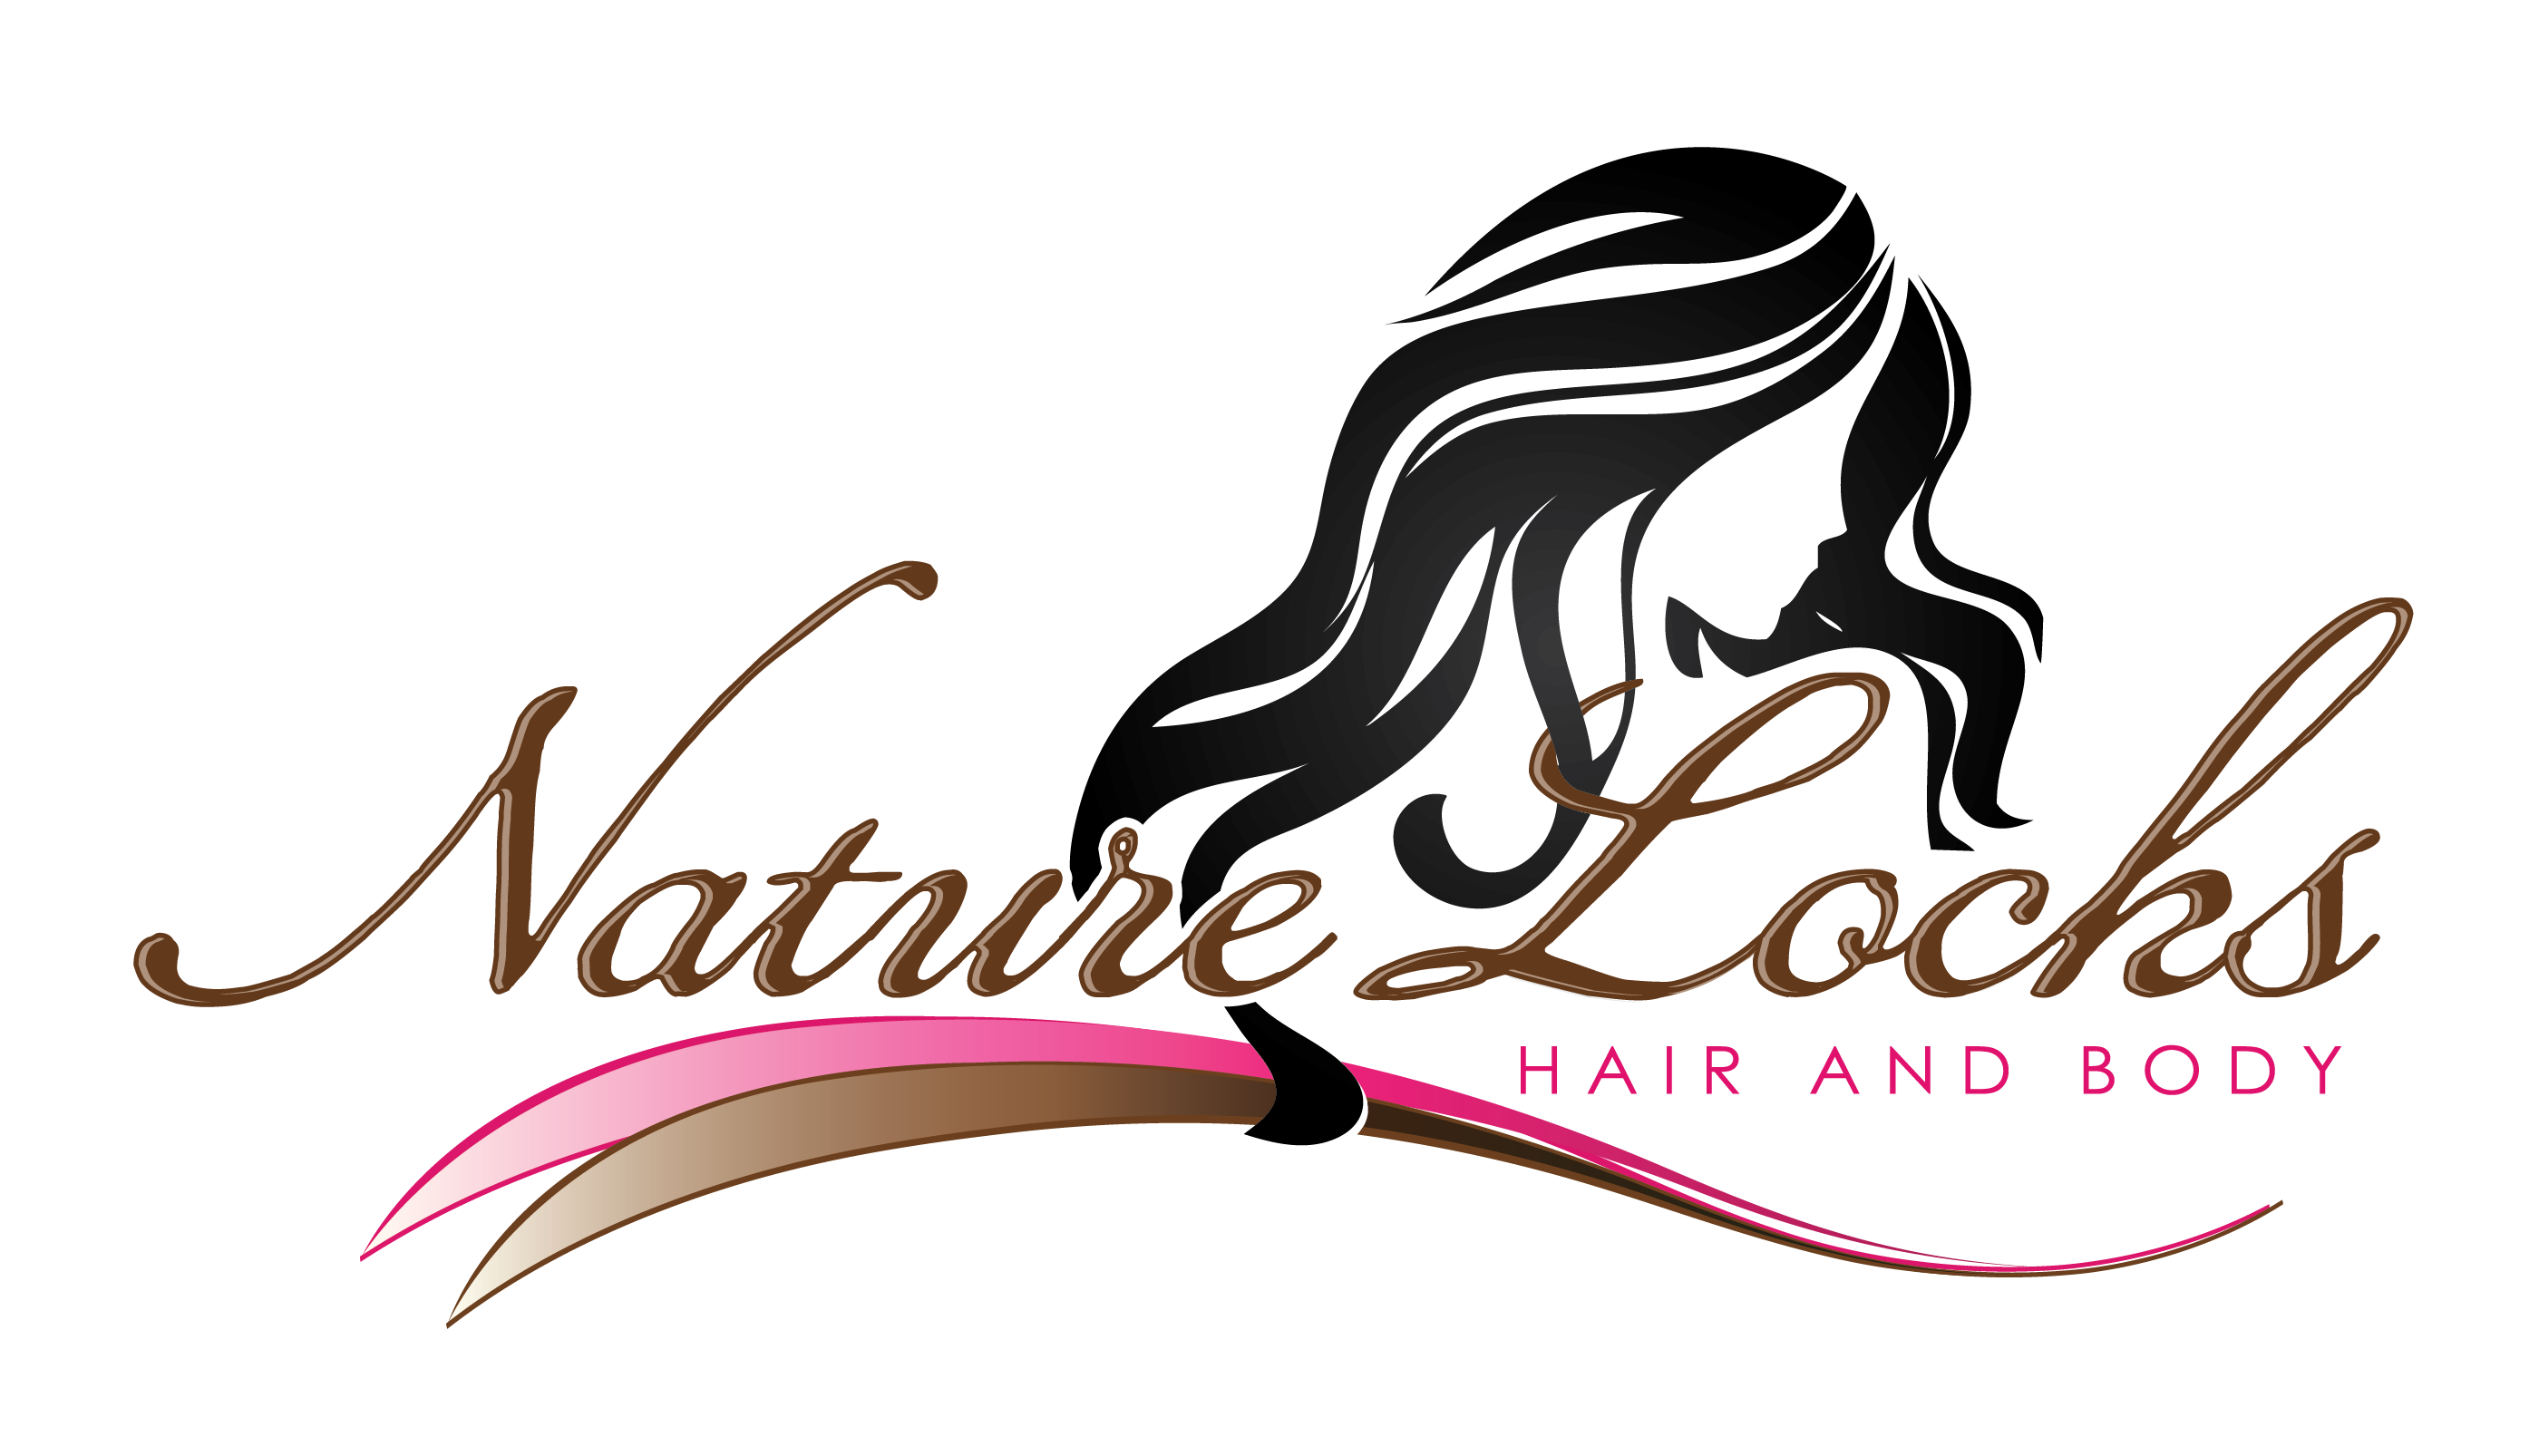 Elegant Hair Extensions Logo Beauty salon logo, Hair